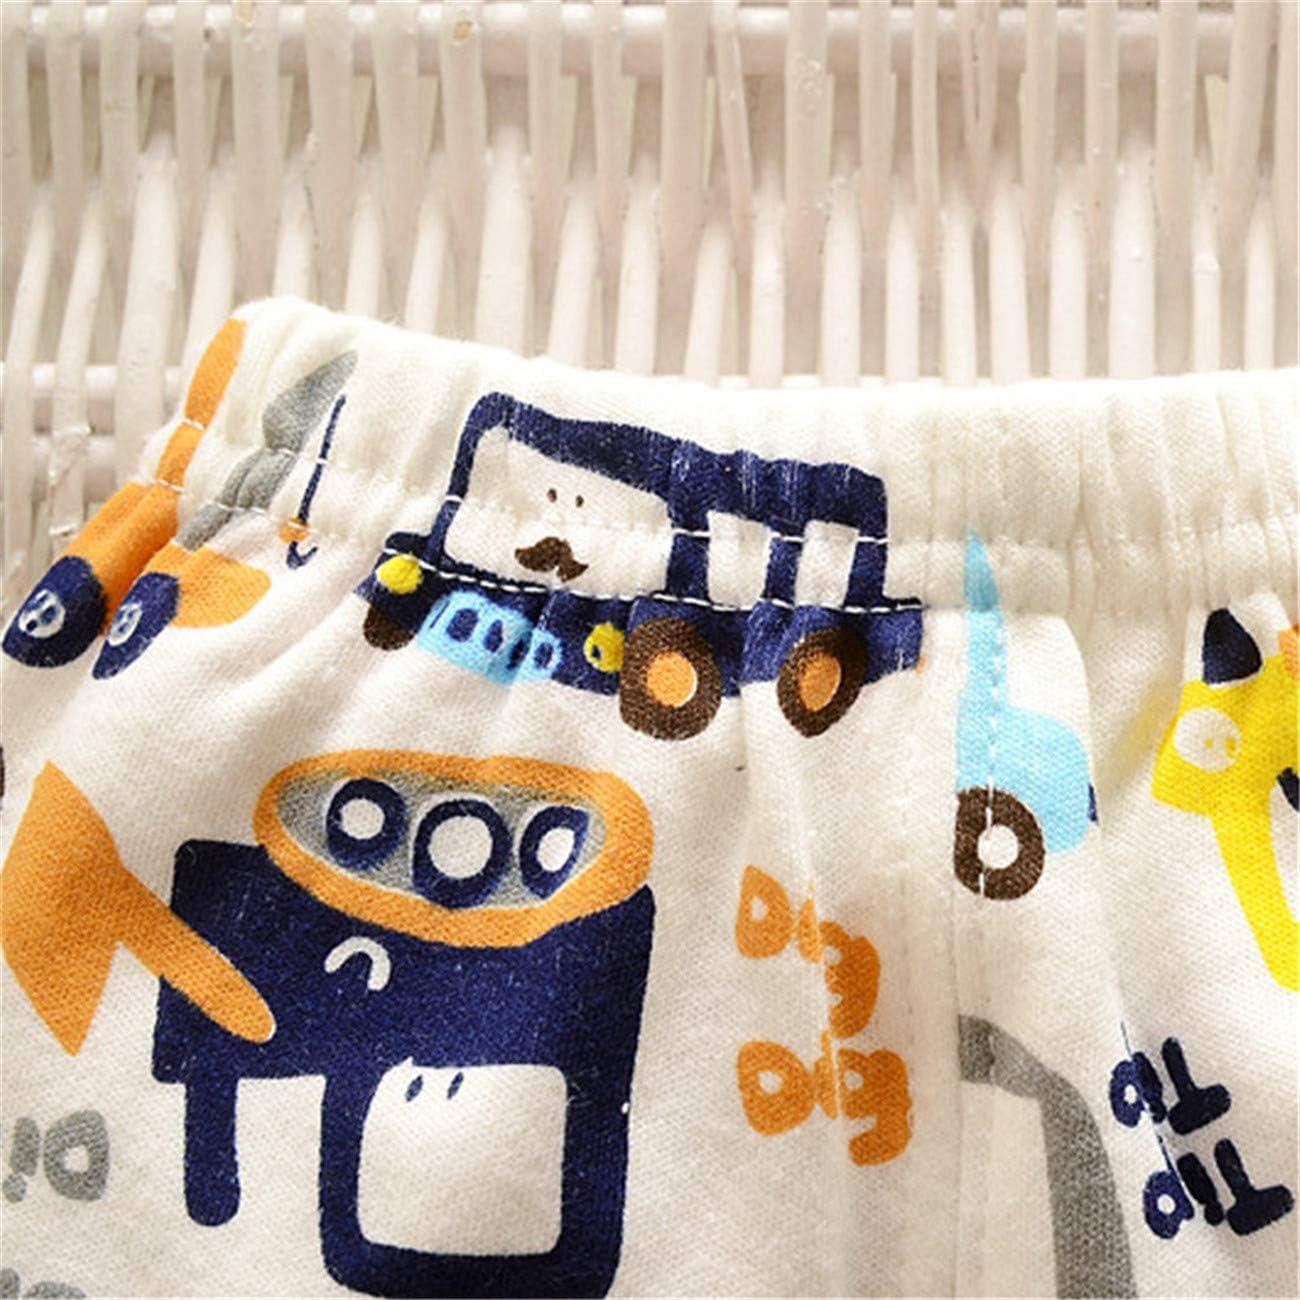 Bigsweety Unisex Pajamas Tee and Pant 2-Piece Pajamas Set Soft Cotton and Linen